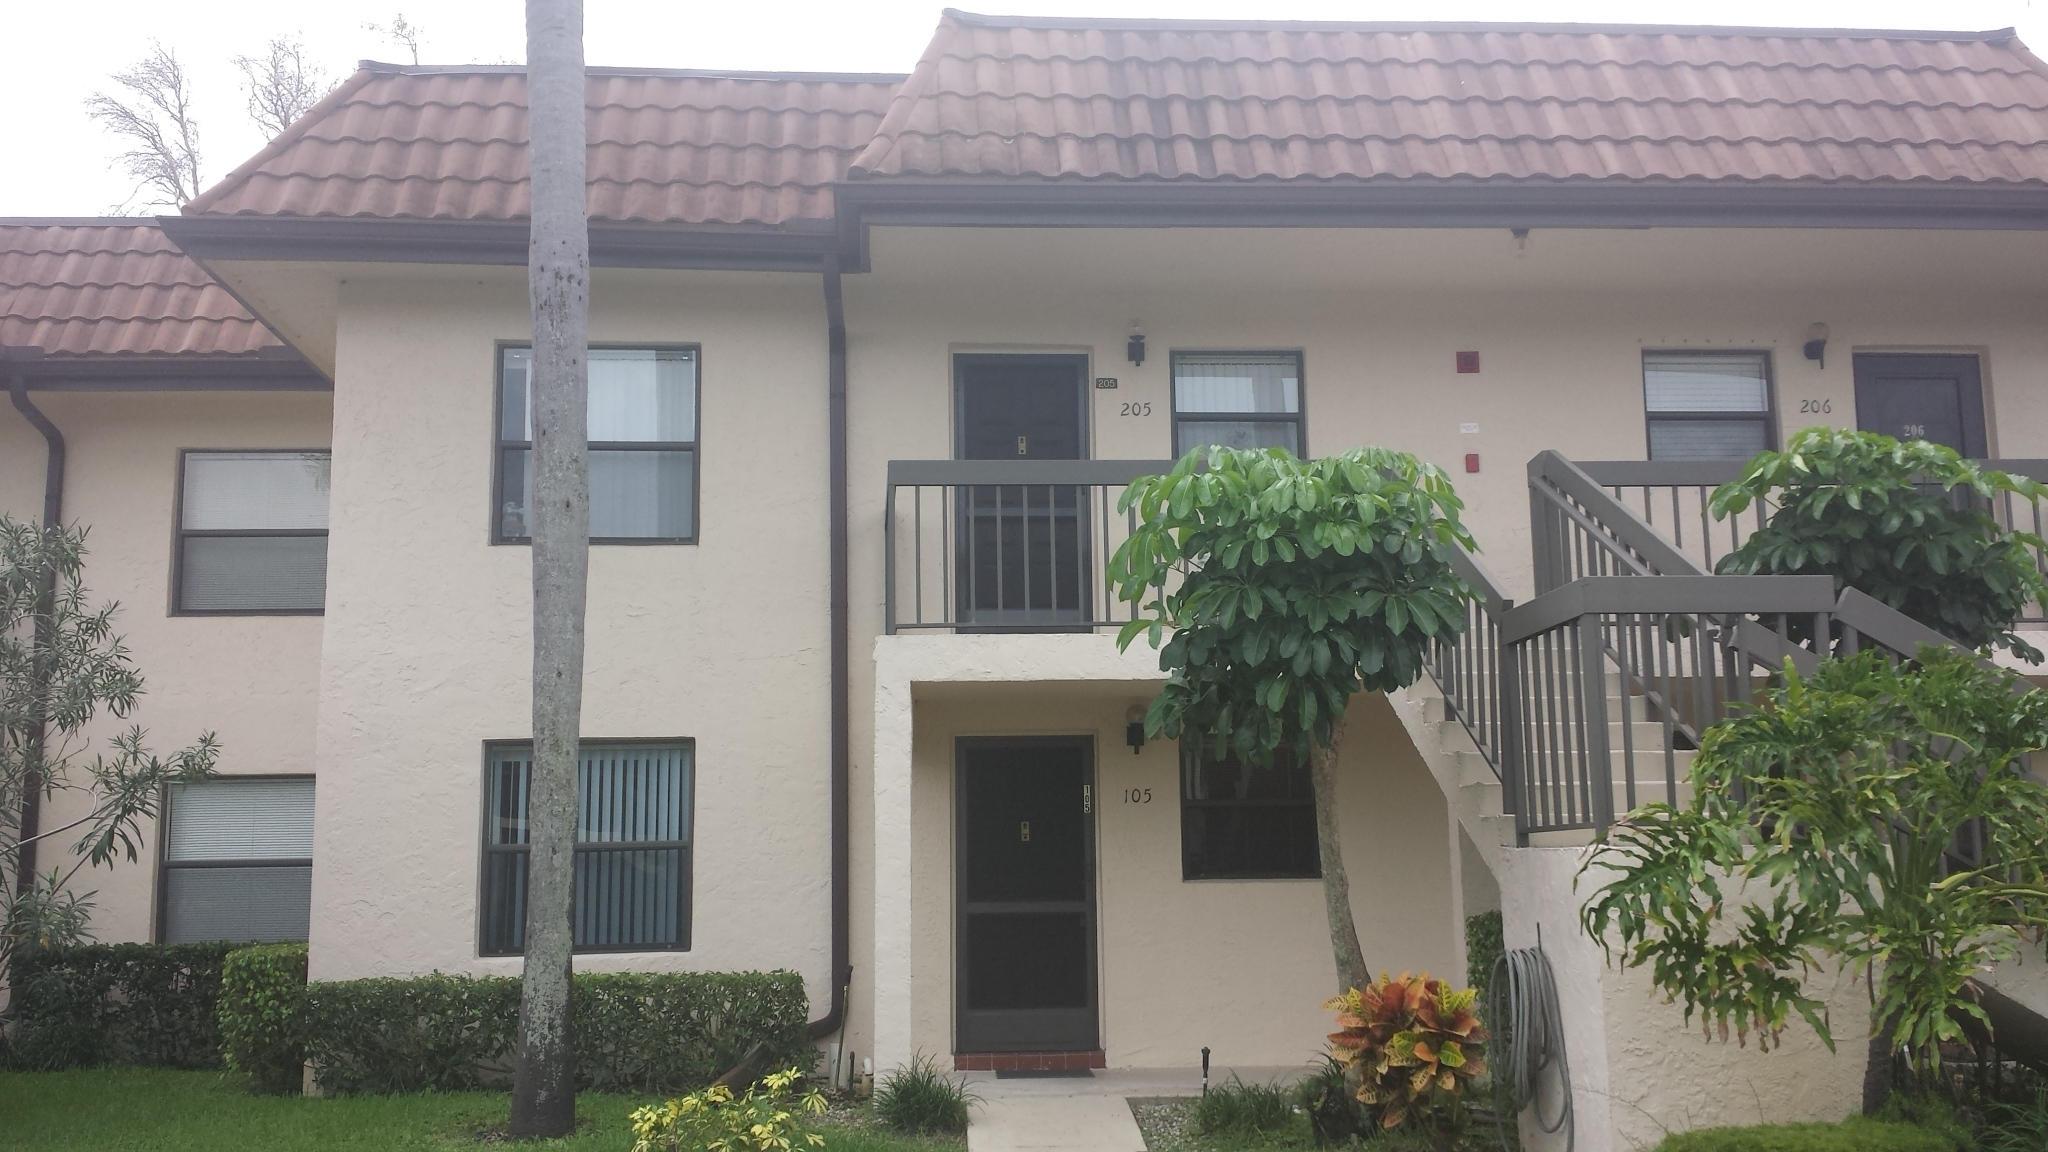 7202 Golf Colony Court 105 Lake Worth, FL 33467